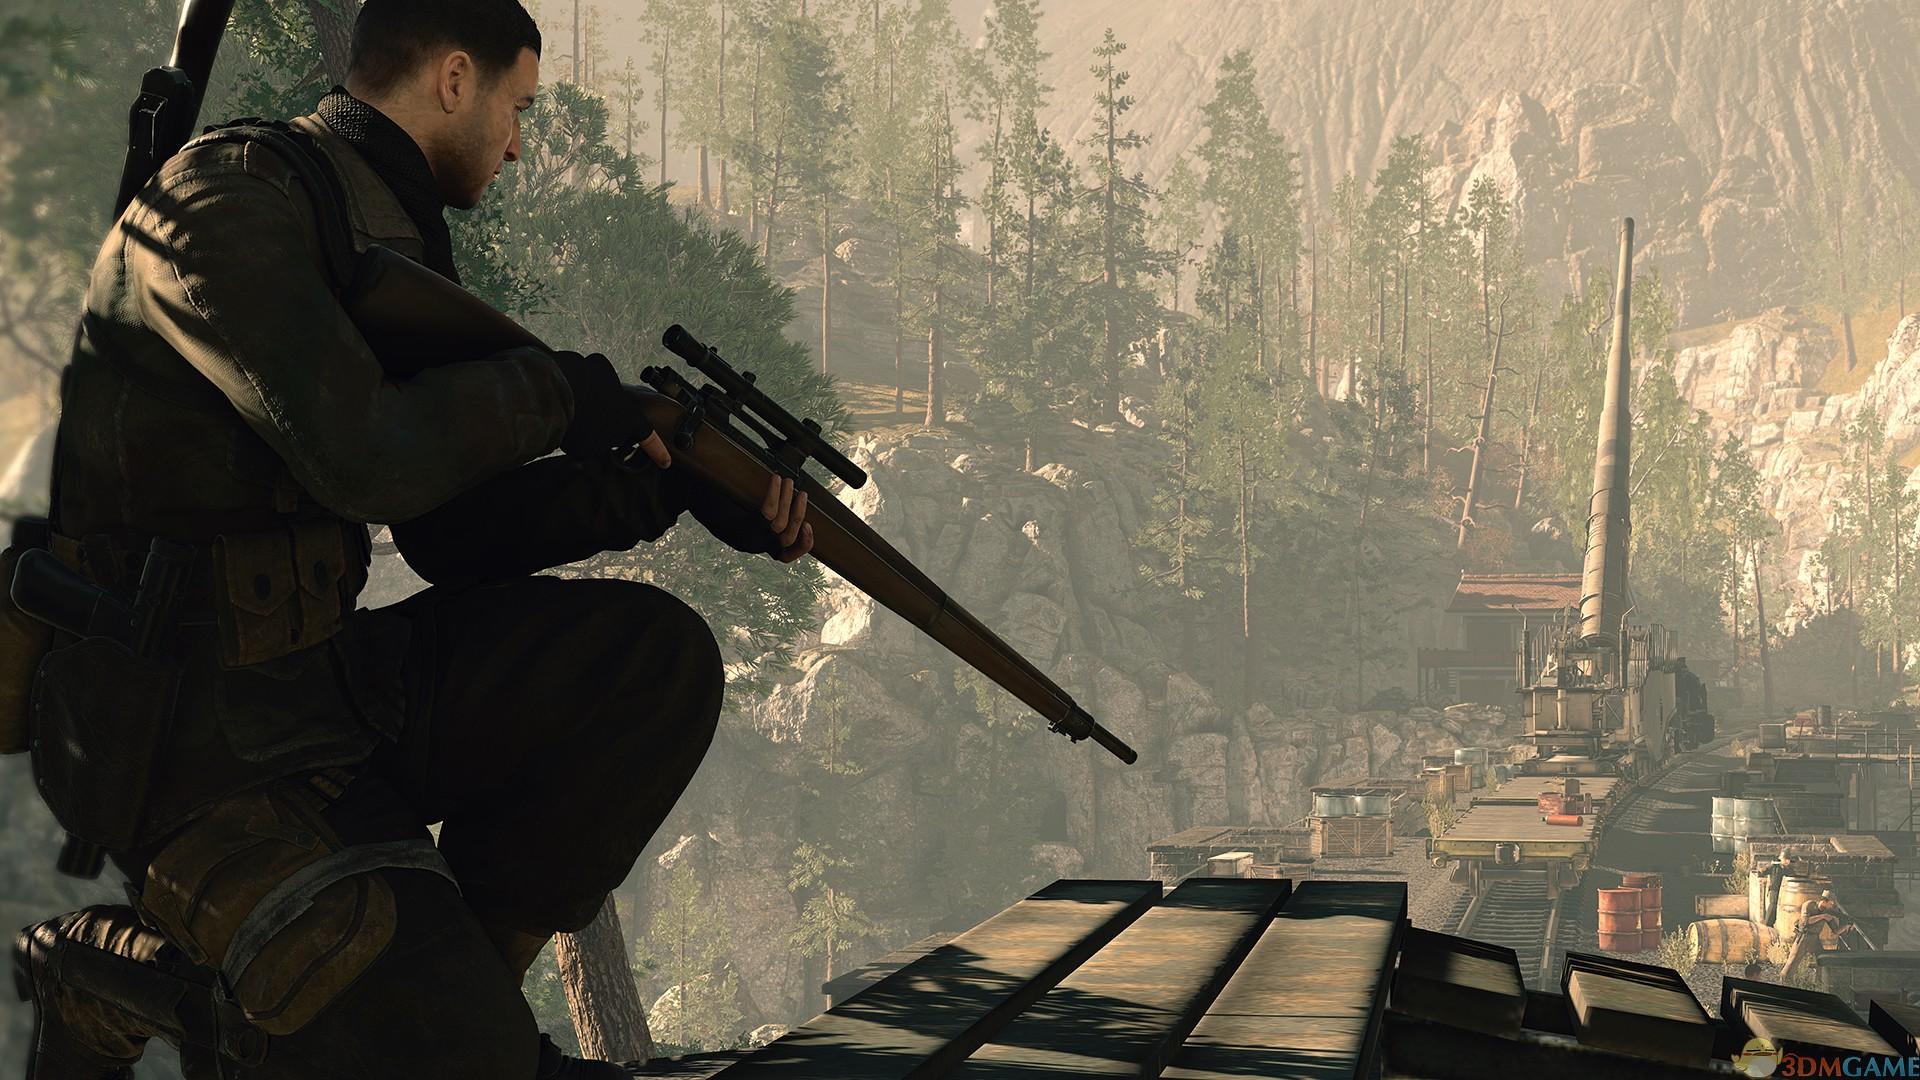 Steam夏促游戏《狙击精英 4》:一人,一枪,一弹,一蛋!